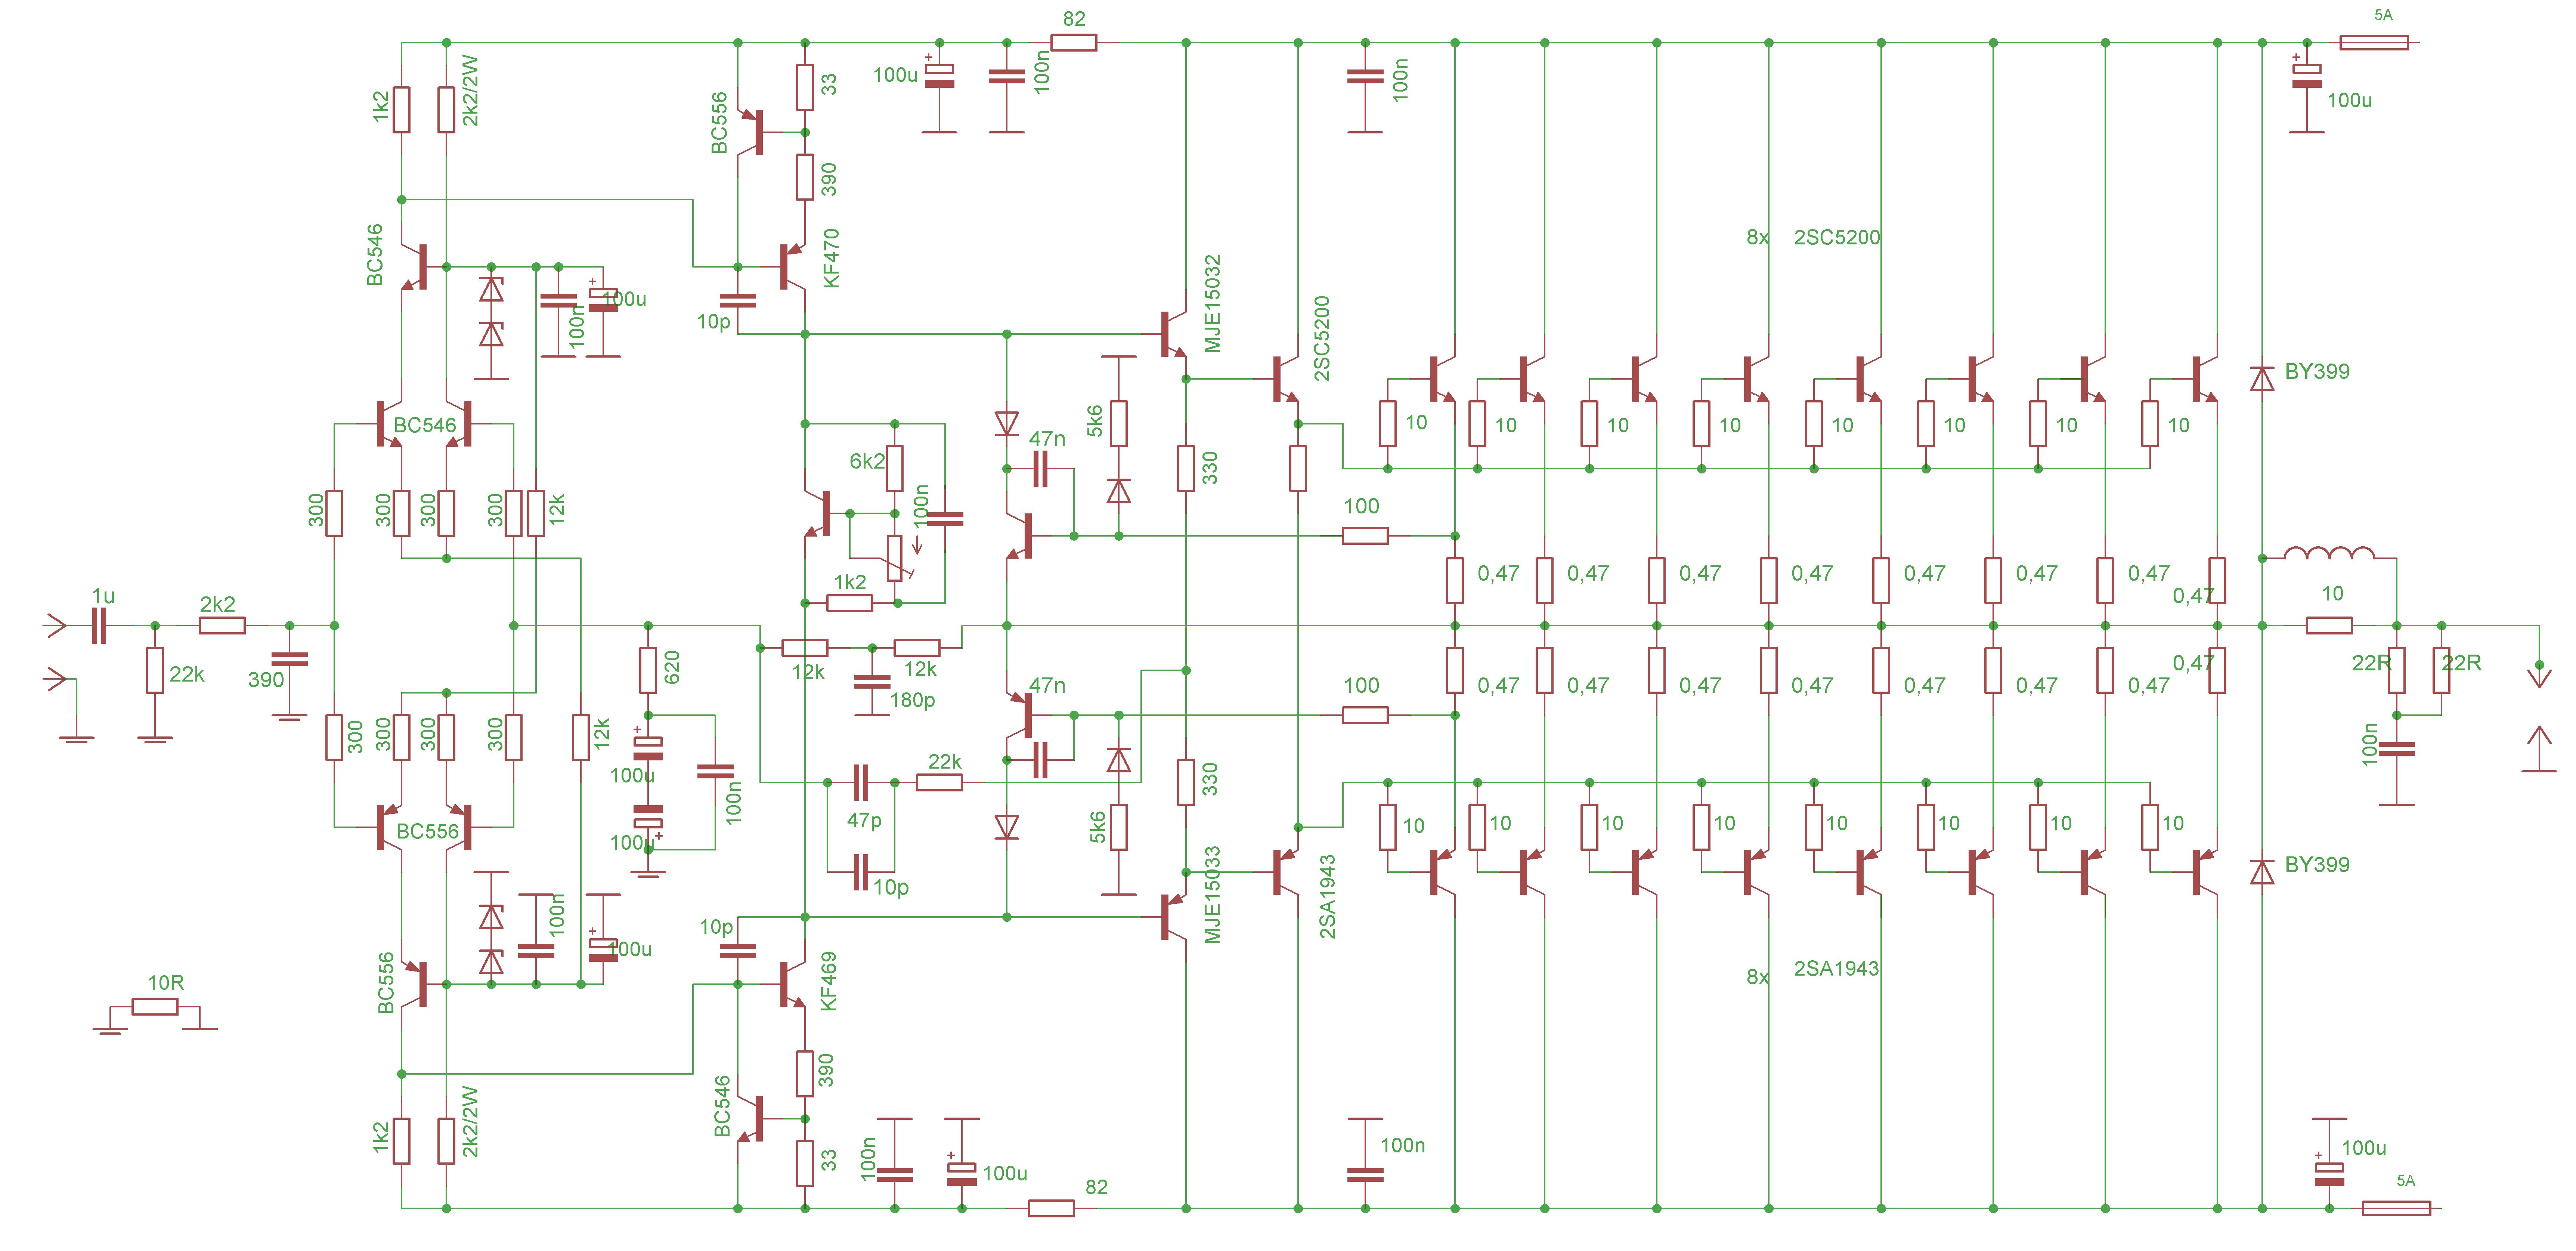 700w Leach Amplifier Electronic Circuits Pinterest Circuit Of Lm380 Amplifiercircuitsaudio